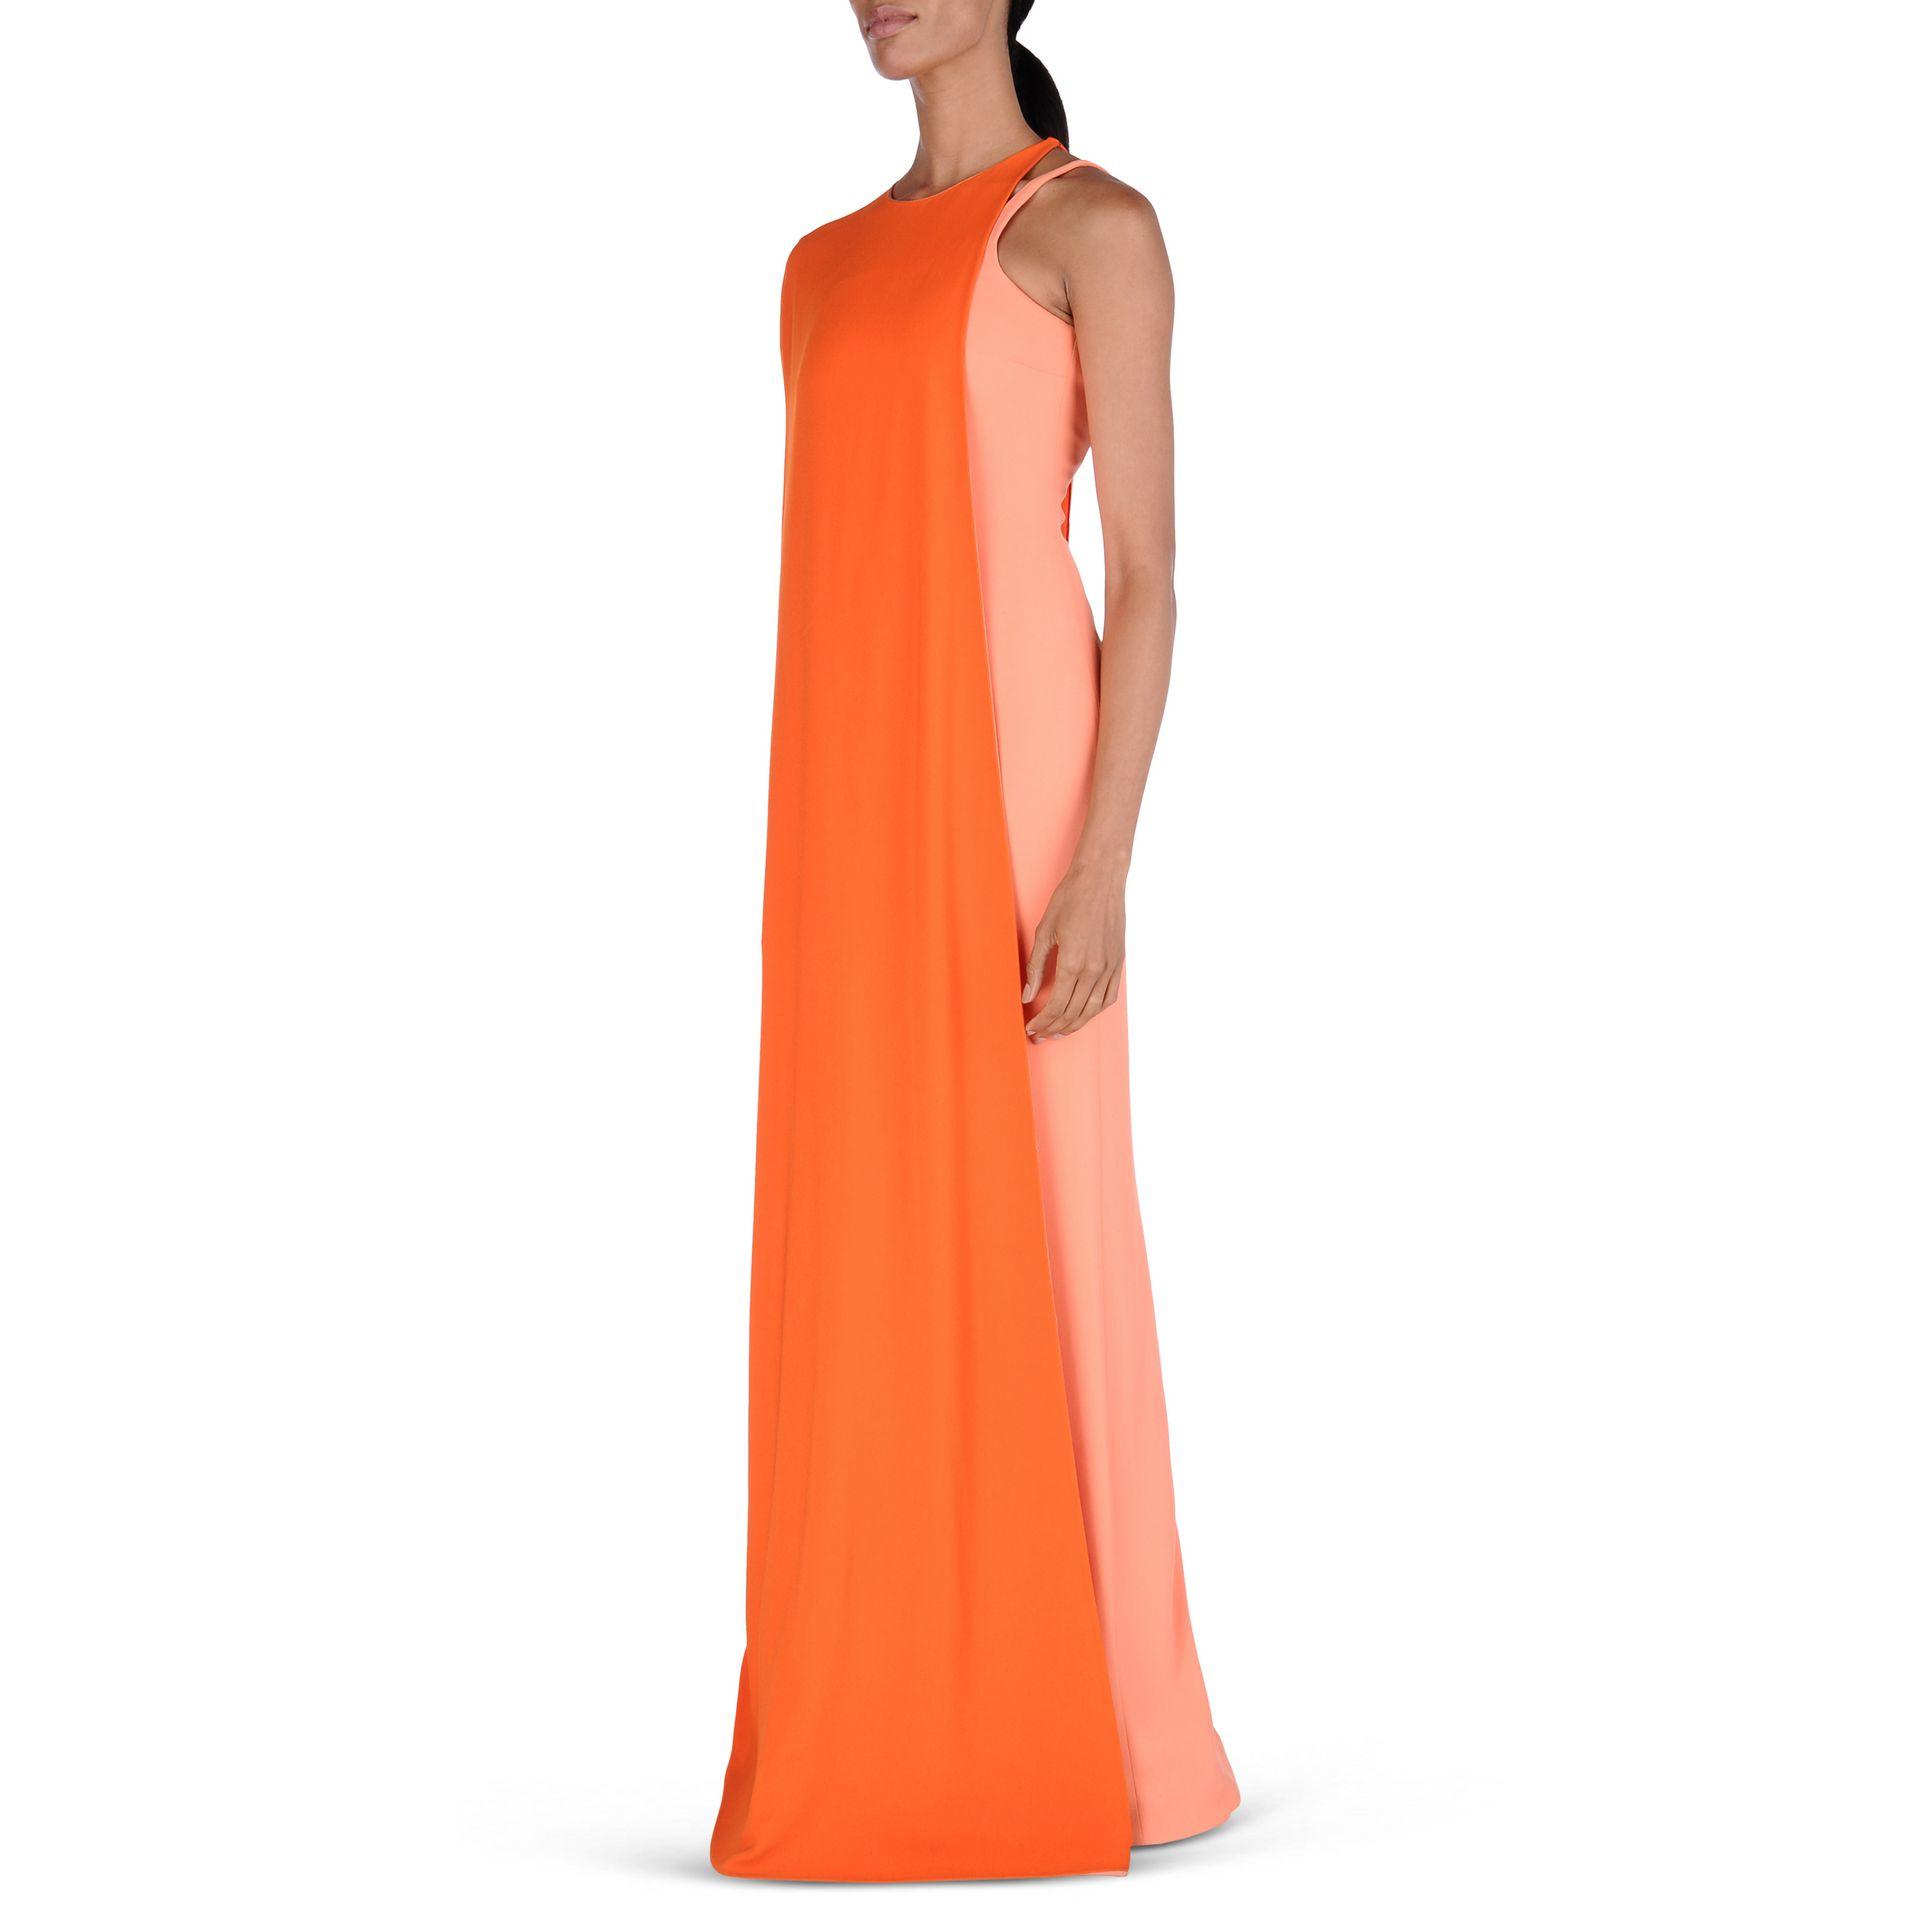 Stella McCartney Orange Dress